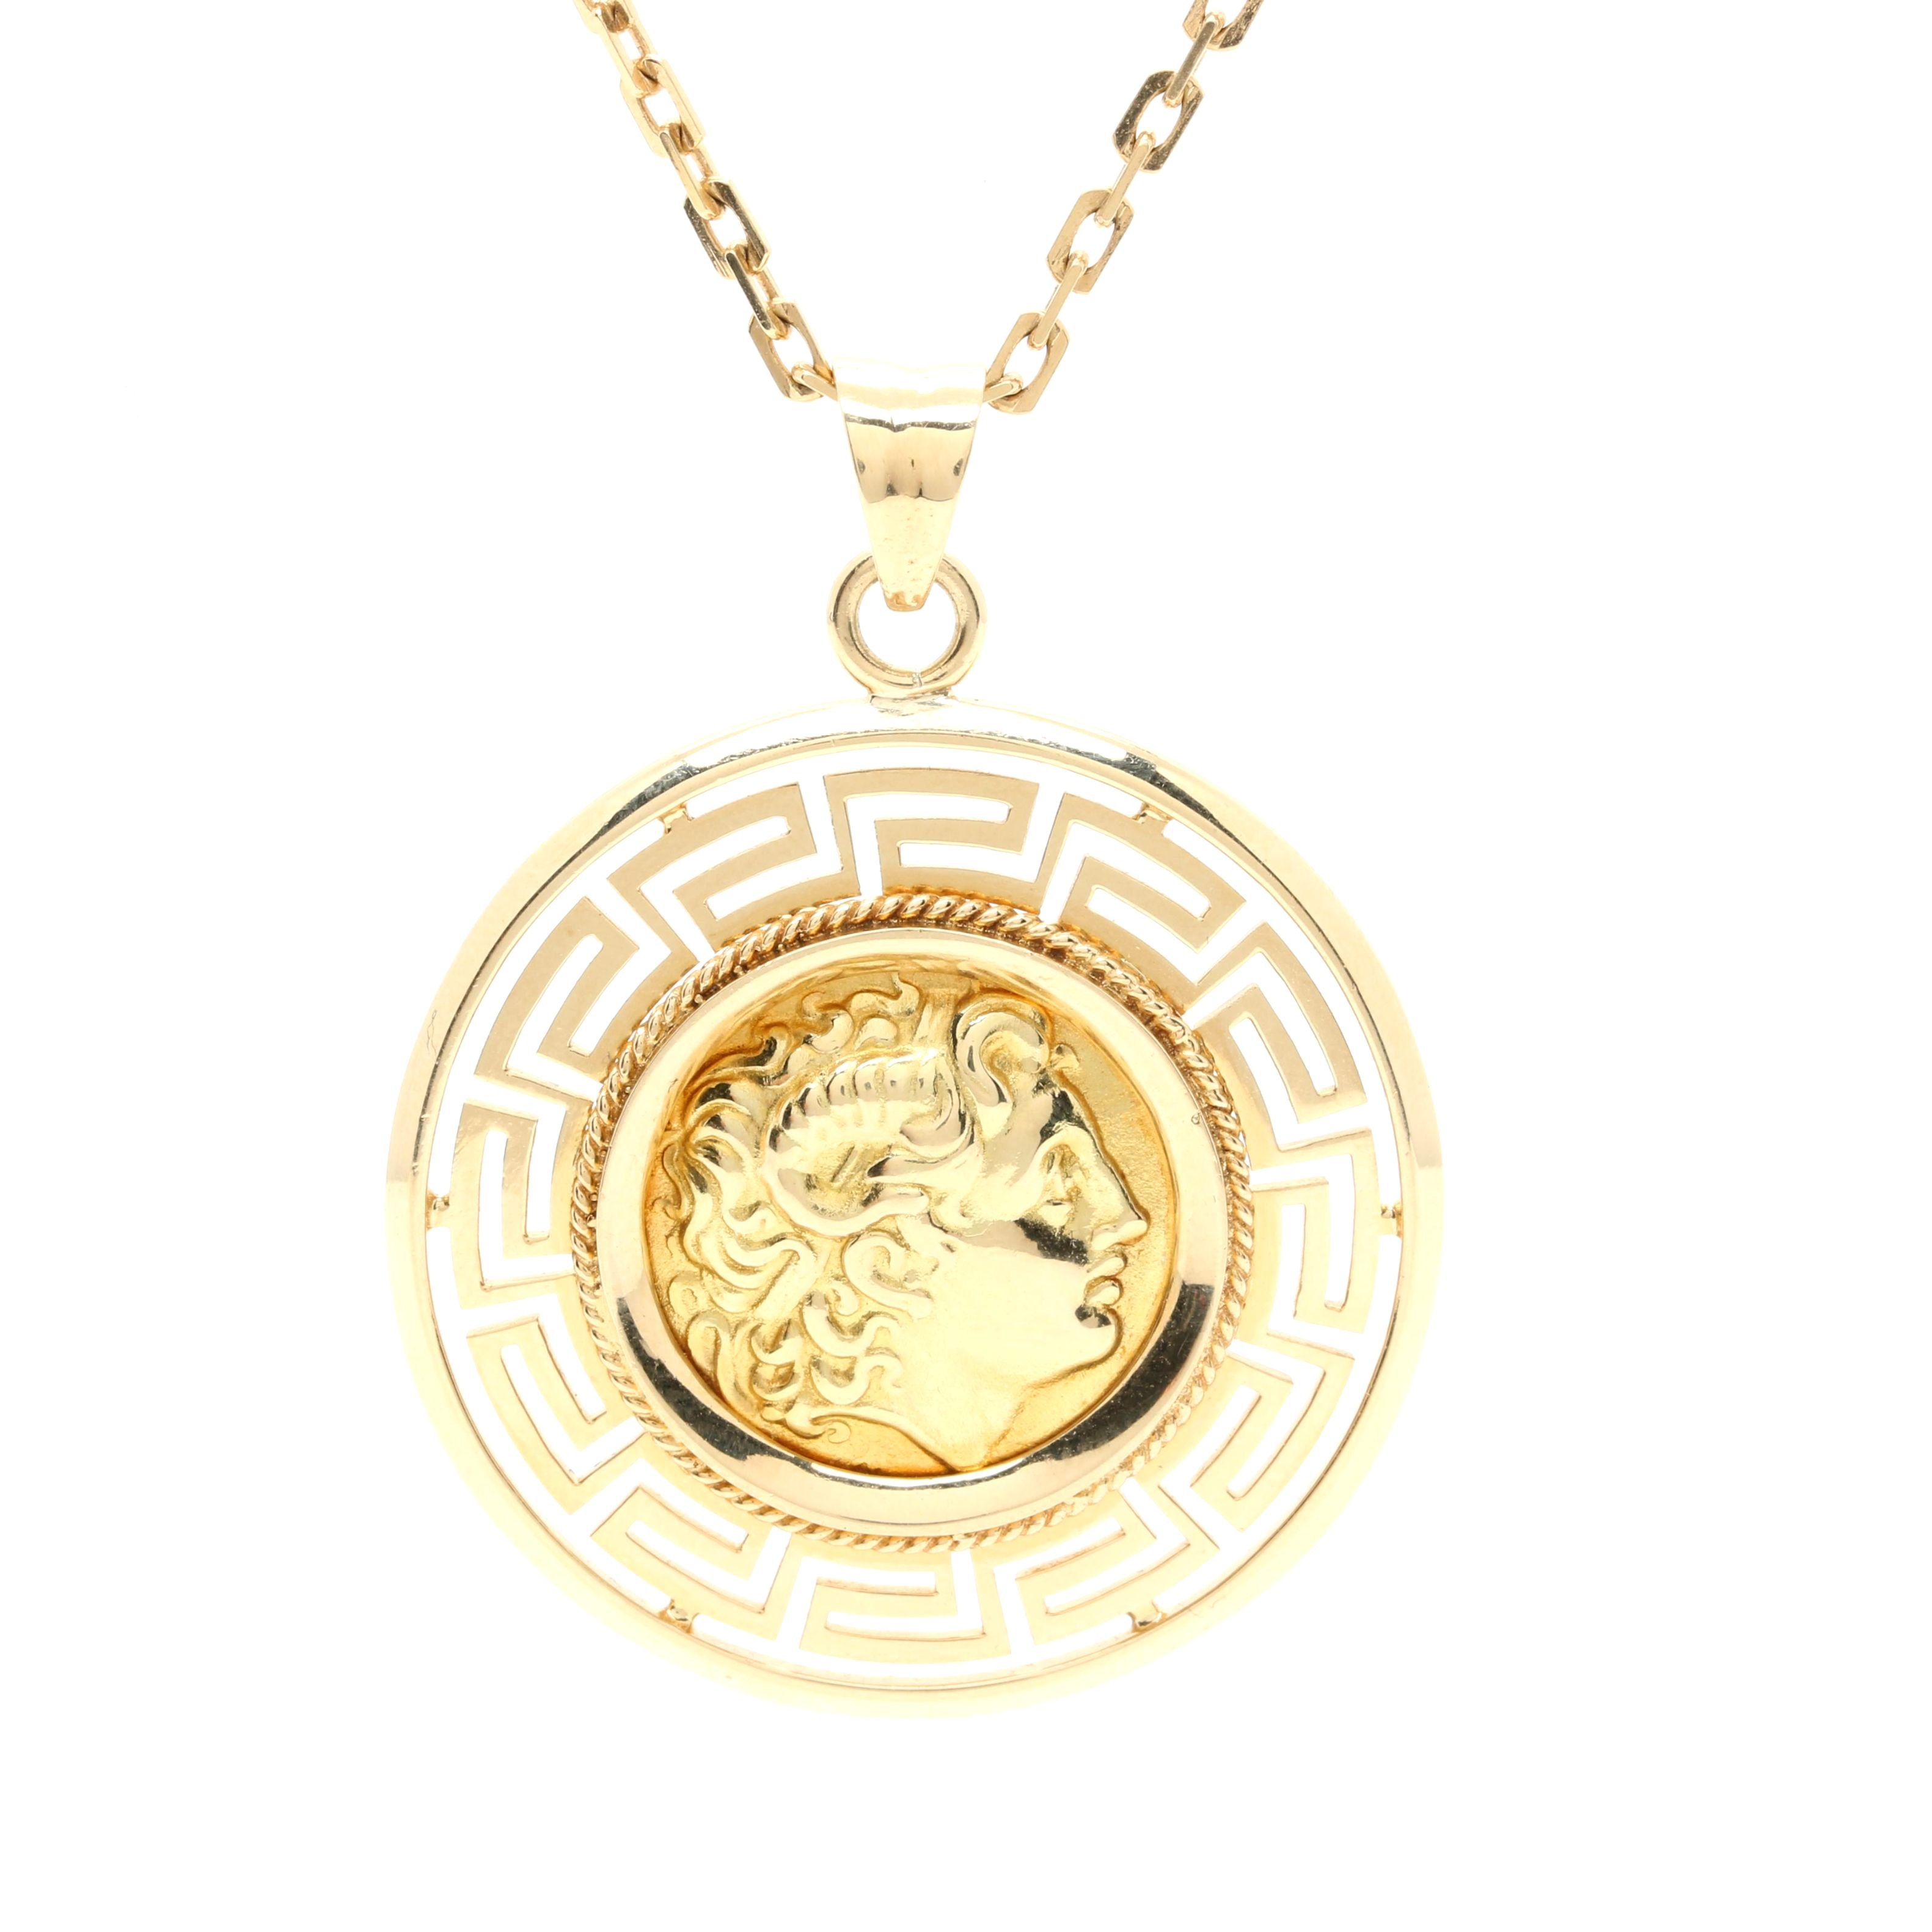 18K Yellow Gold Fantasy Coin Pendant Necklace